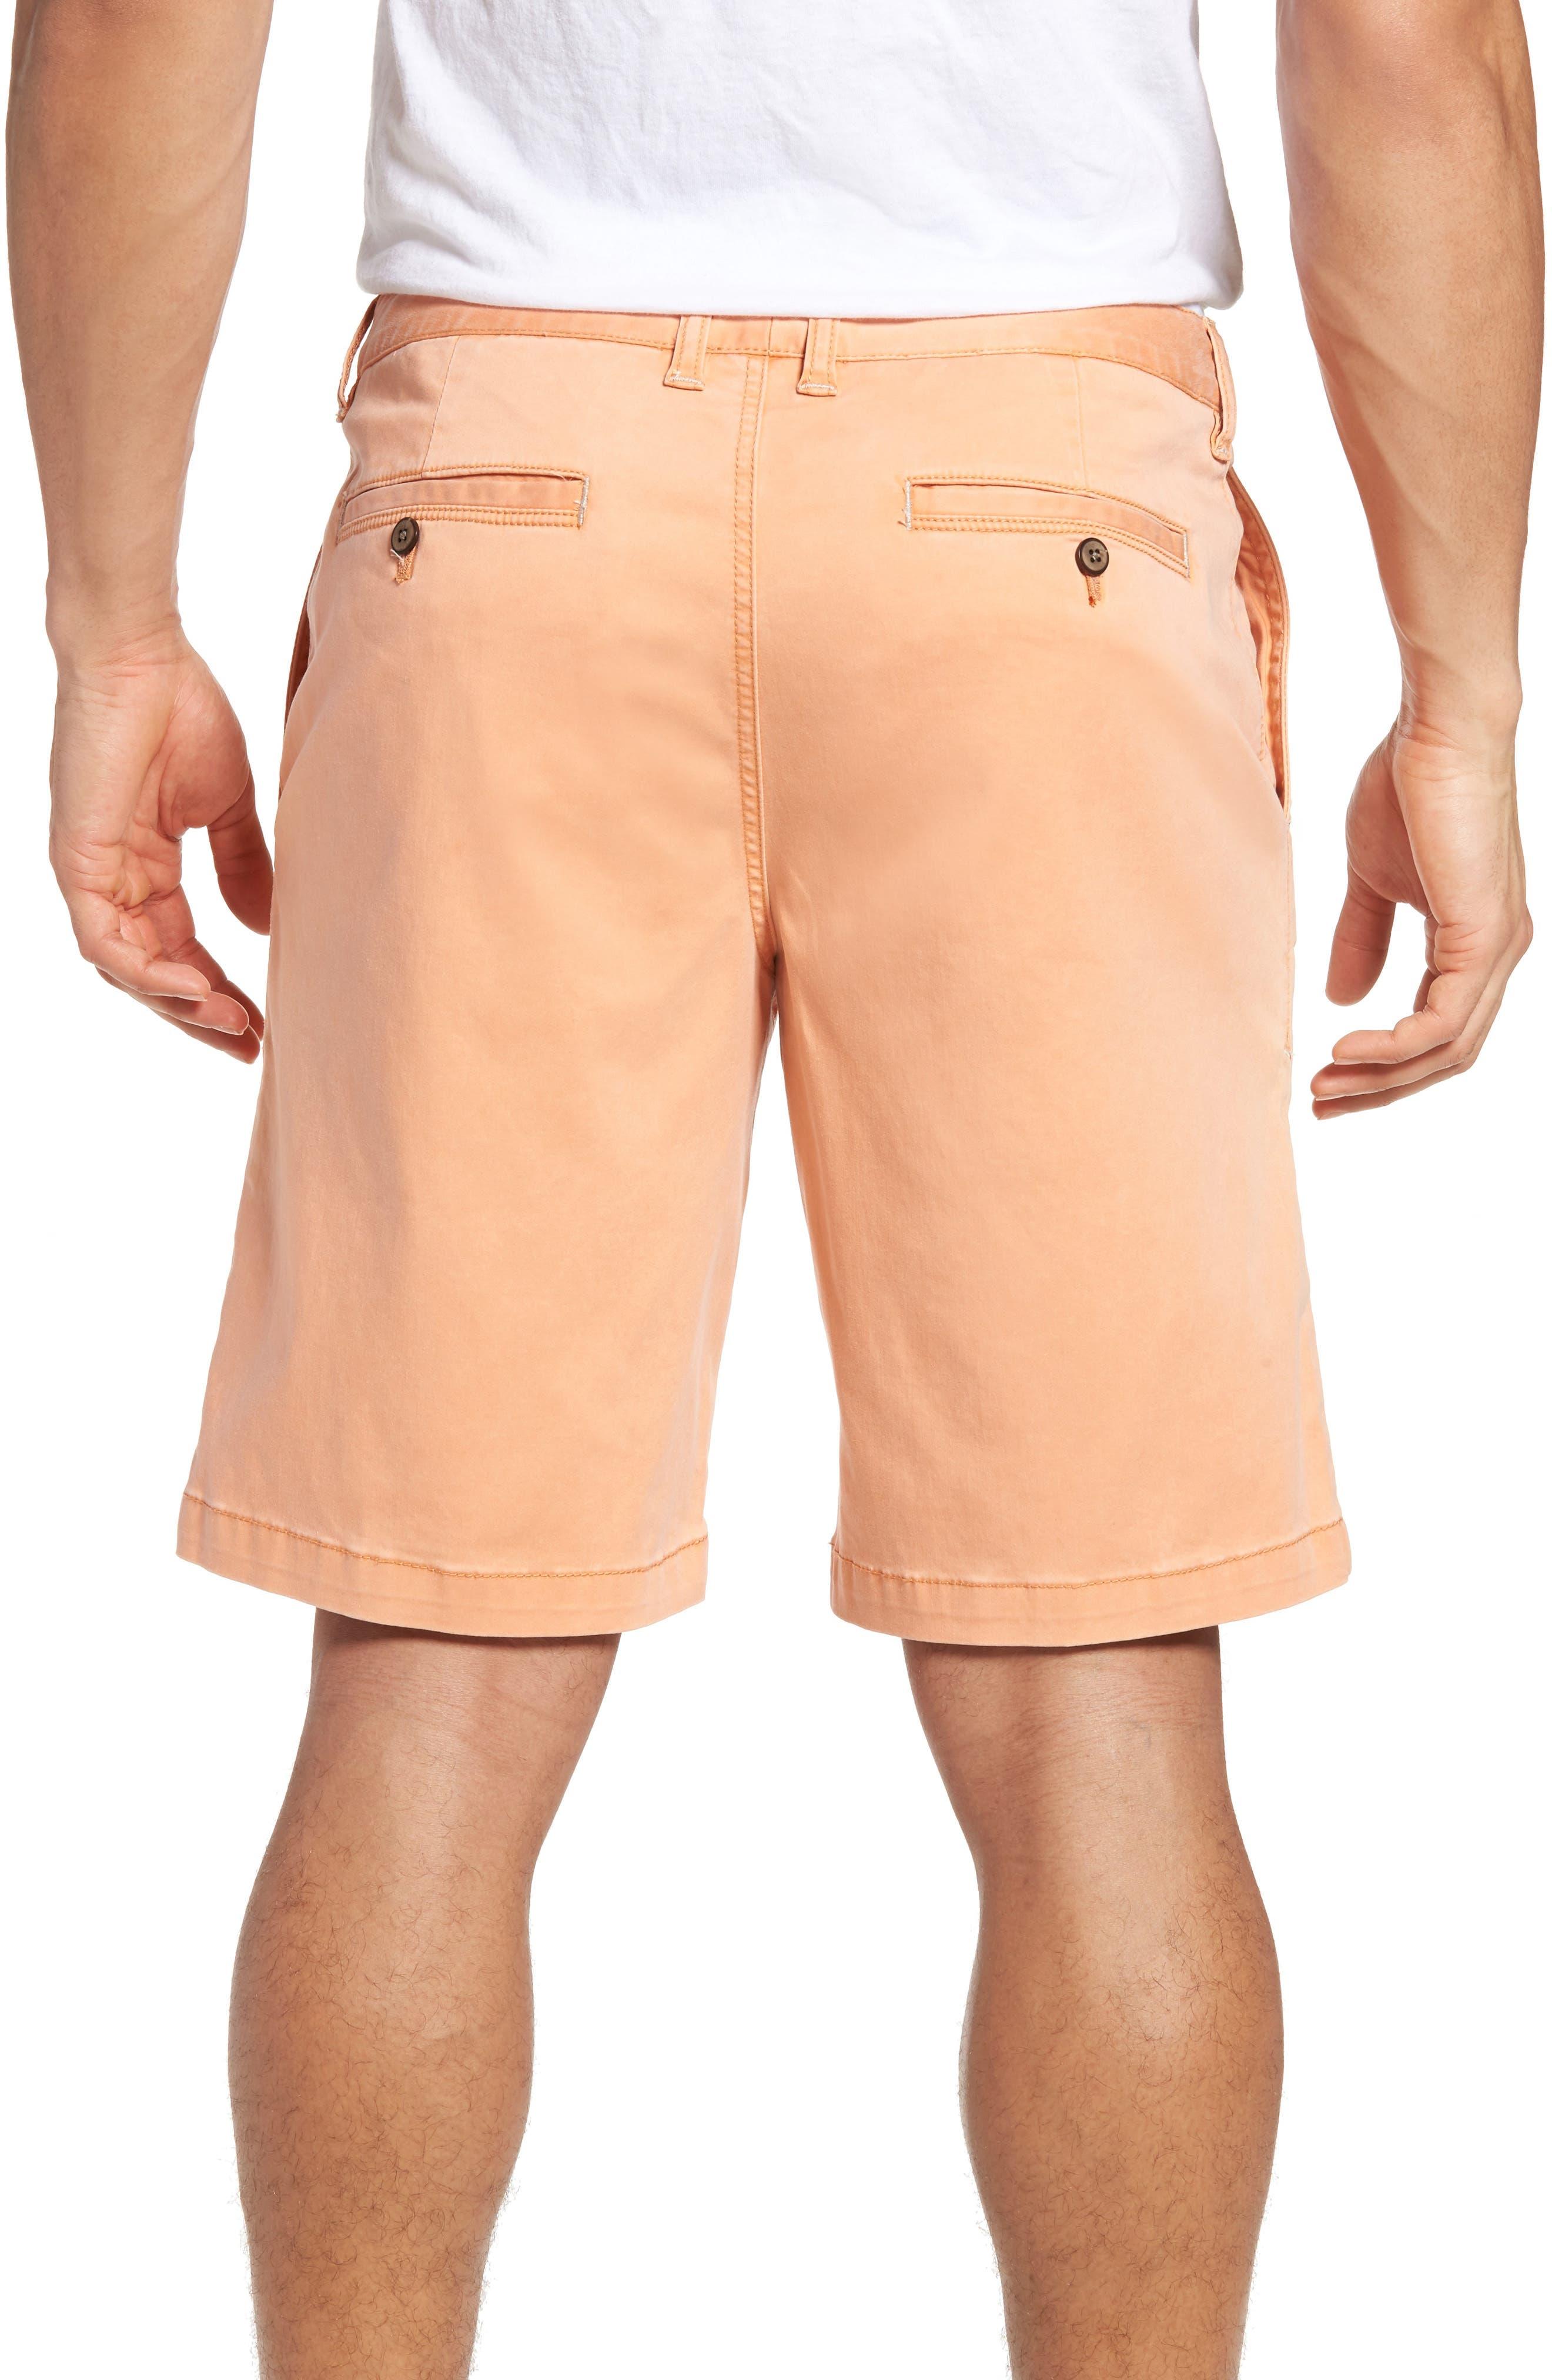 Boracay Chino Shorts,                             Alternate thumbnail 18, color,